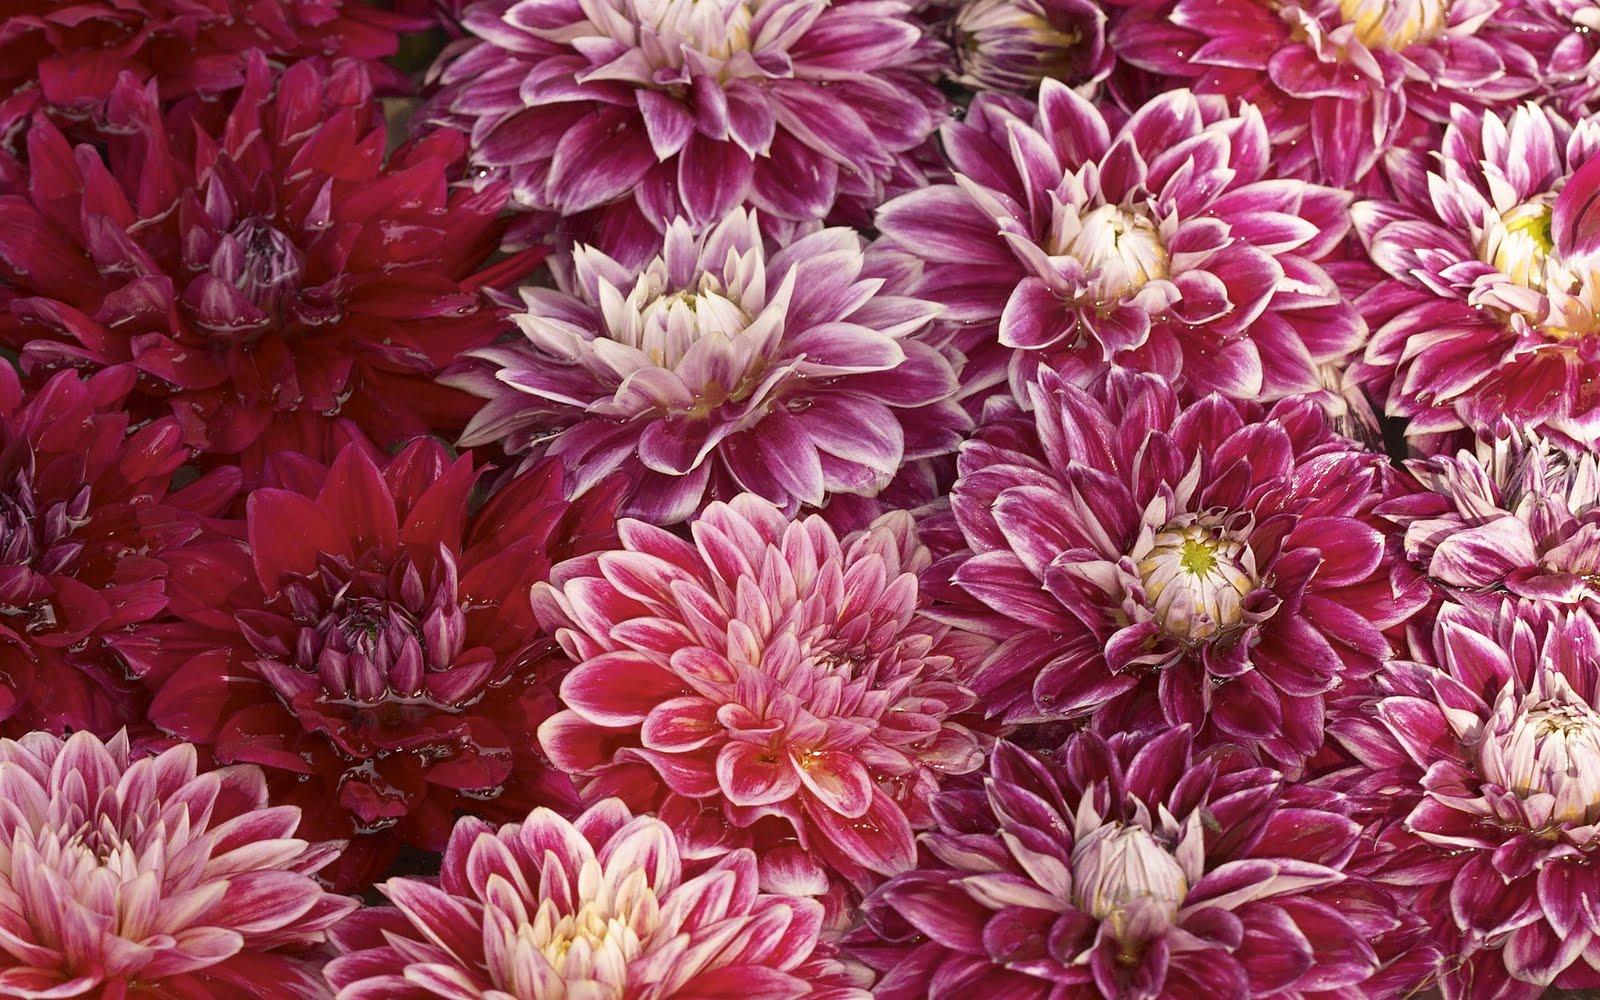 Wwe Wrestlers Profile Beautiful Mum Flower Wallpapers